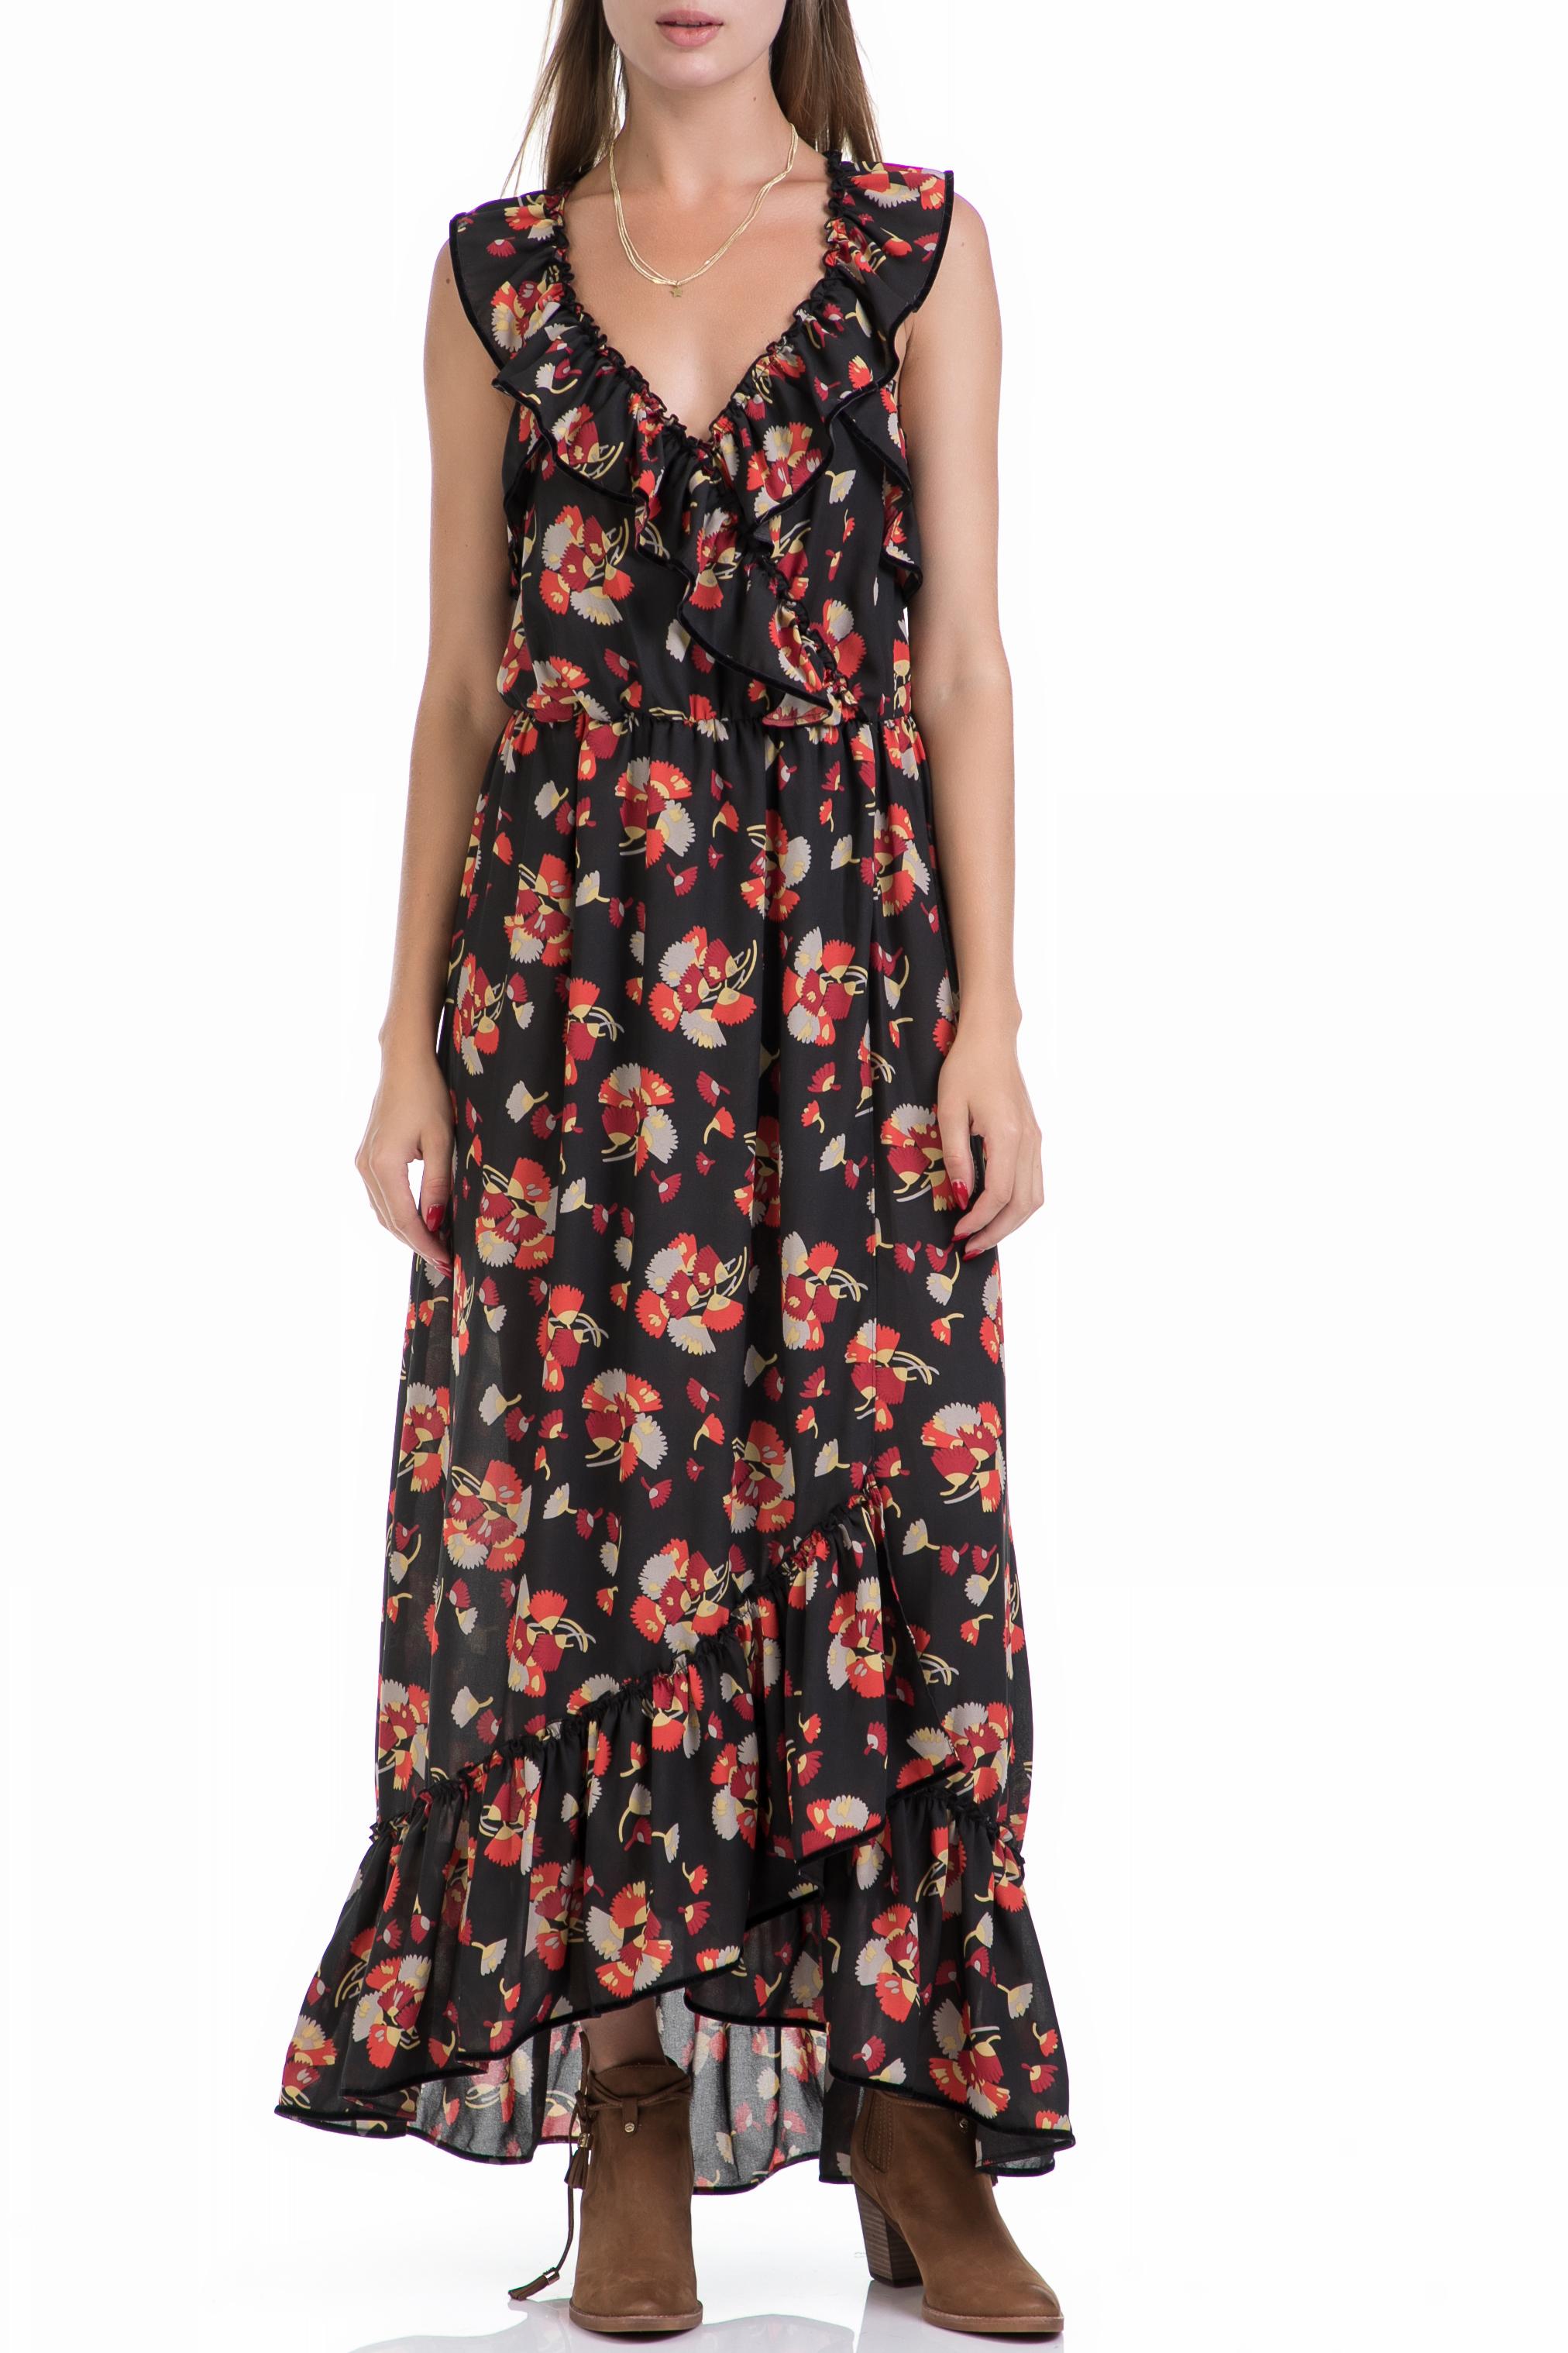 SCOTCH & SODA - Γυναικείο φόρεμα MAISON SCOTCH μαύρο-εμπριμέ γυναικεία ρούχα φορέματα μάξι